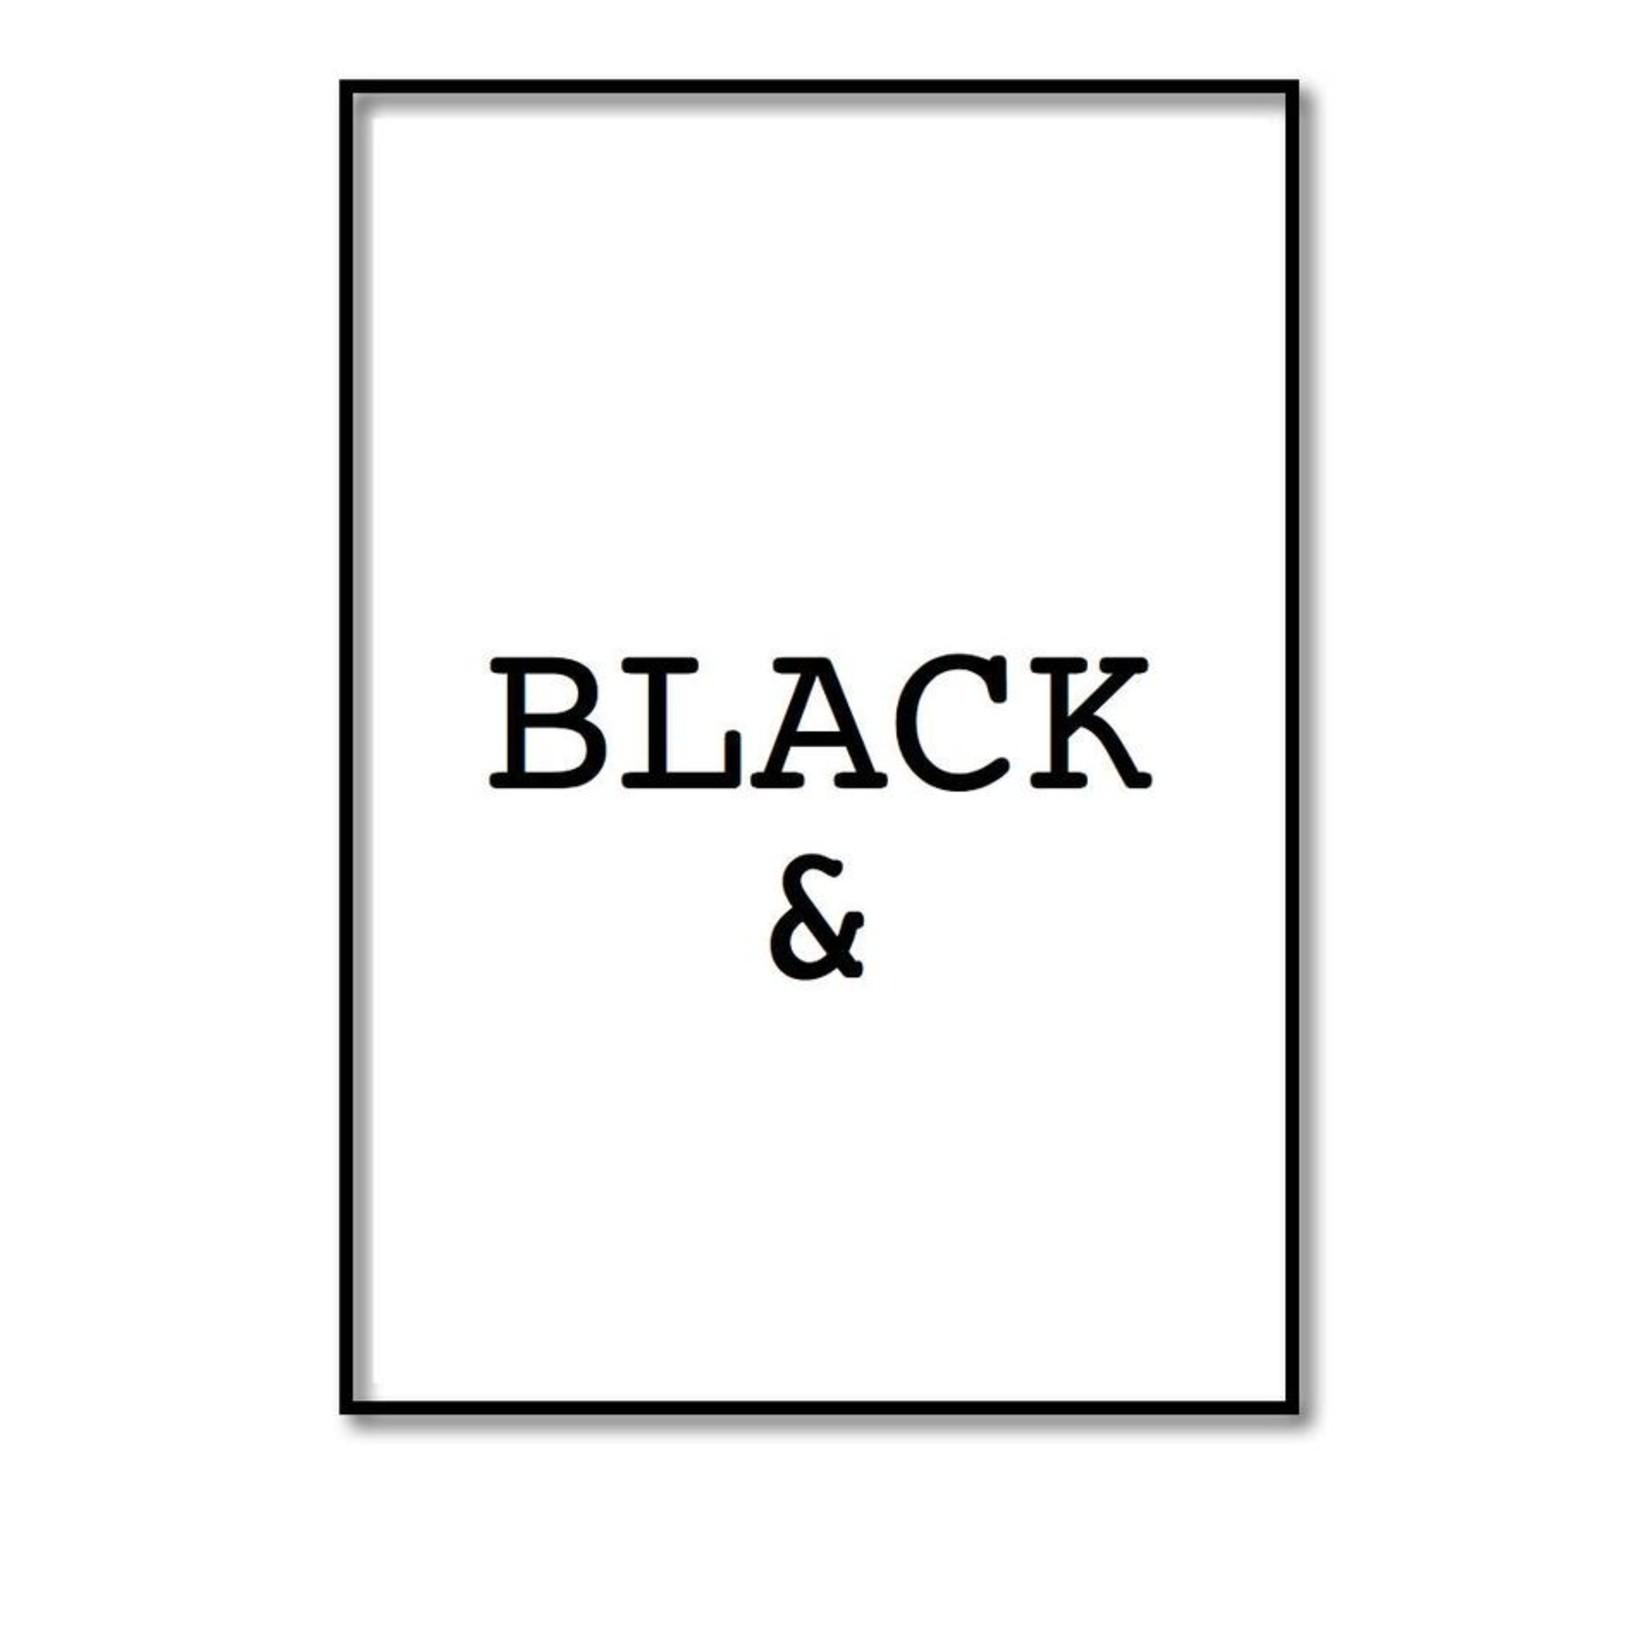 Pixelposter - Black & (A4)